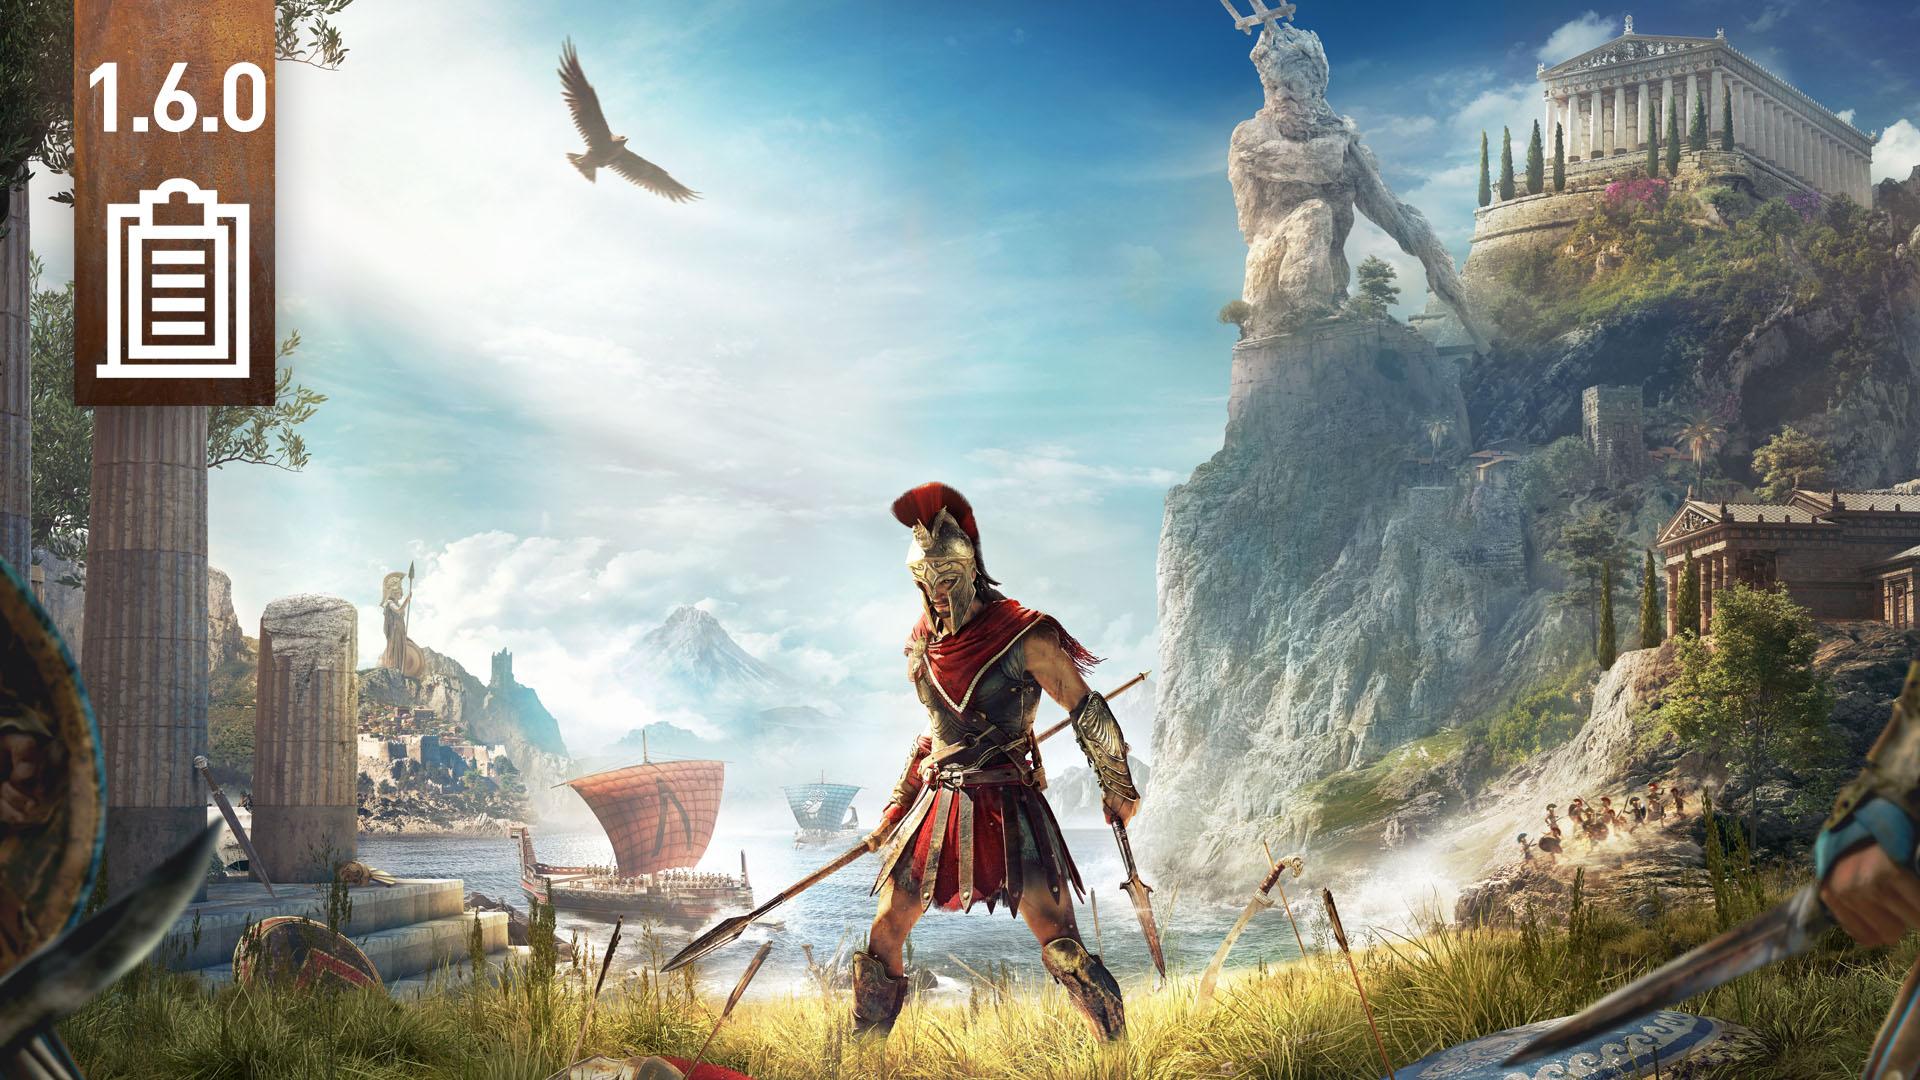 Patch 1.60 wkrótce dla Assassin's Creed Odyssey